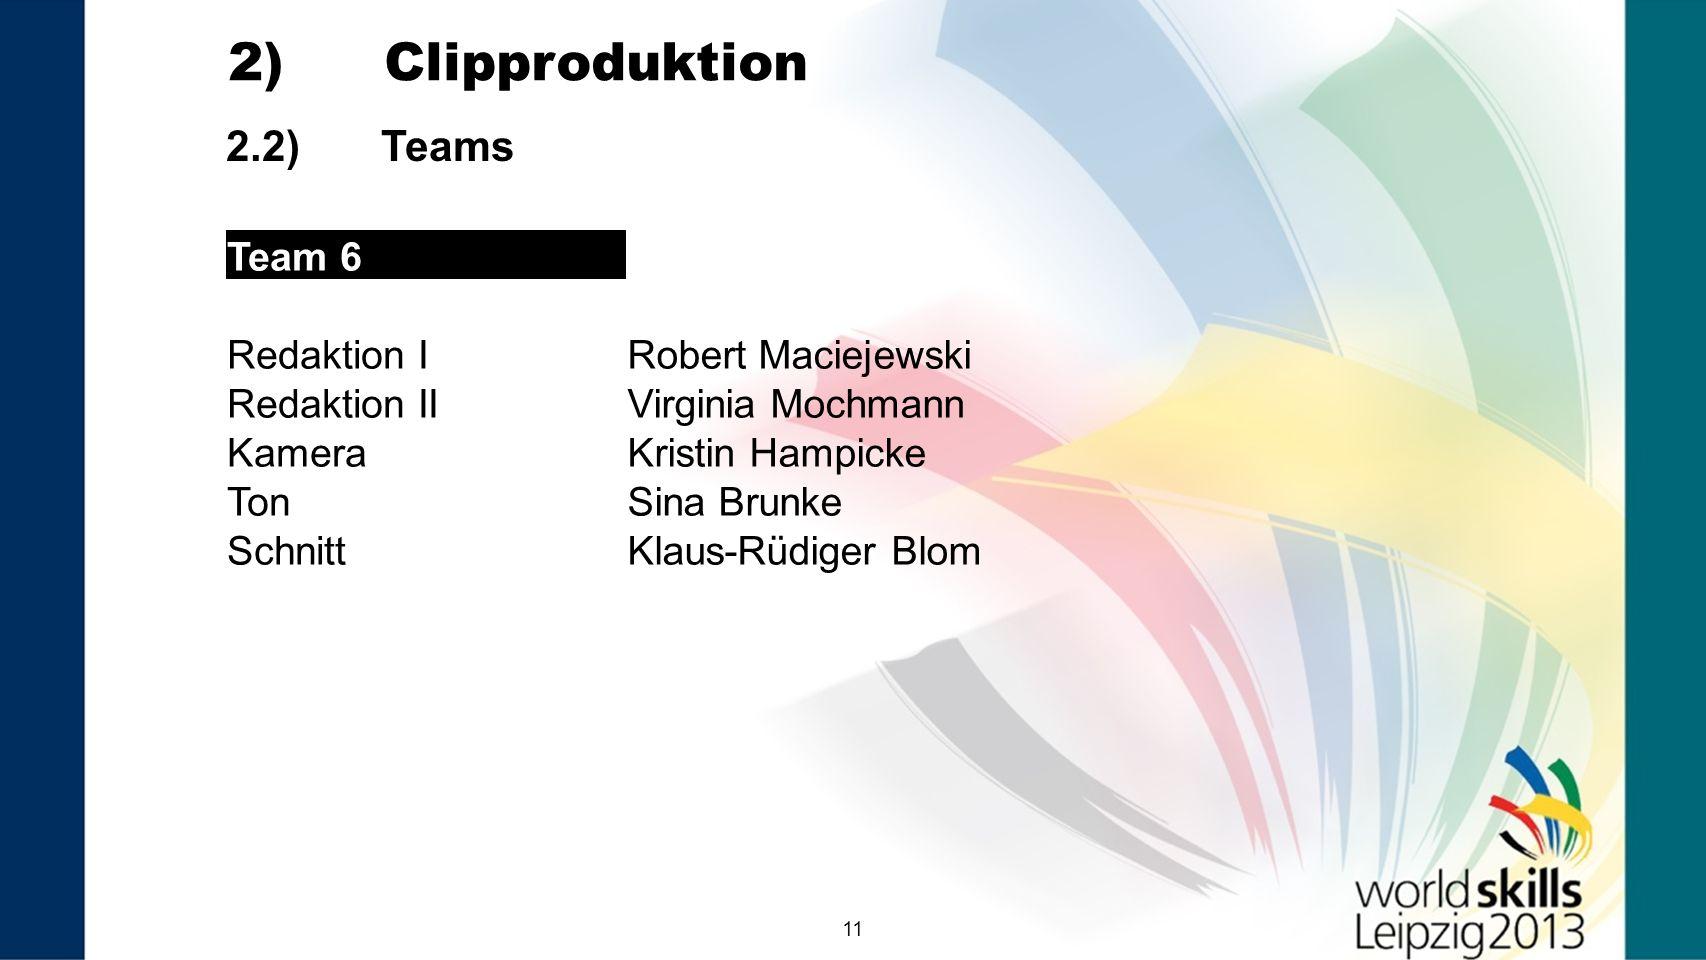 11 2.2) Teams 2) Clipproduktion Team 6 Redaktion IRobert Maciejewski Redaktion IIVirginia Mochmann KameraKristin Hampicke TonSina Brunke SchnittKlaus-Rüdiger Blom